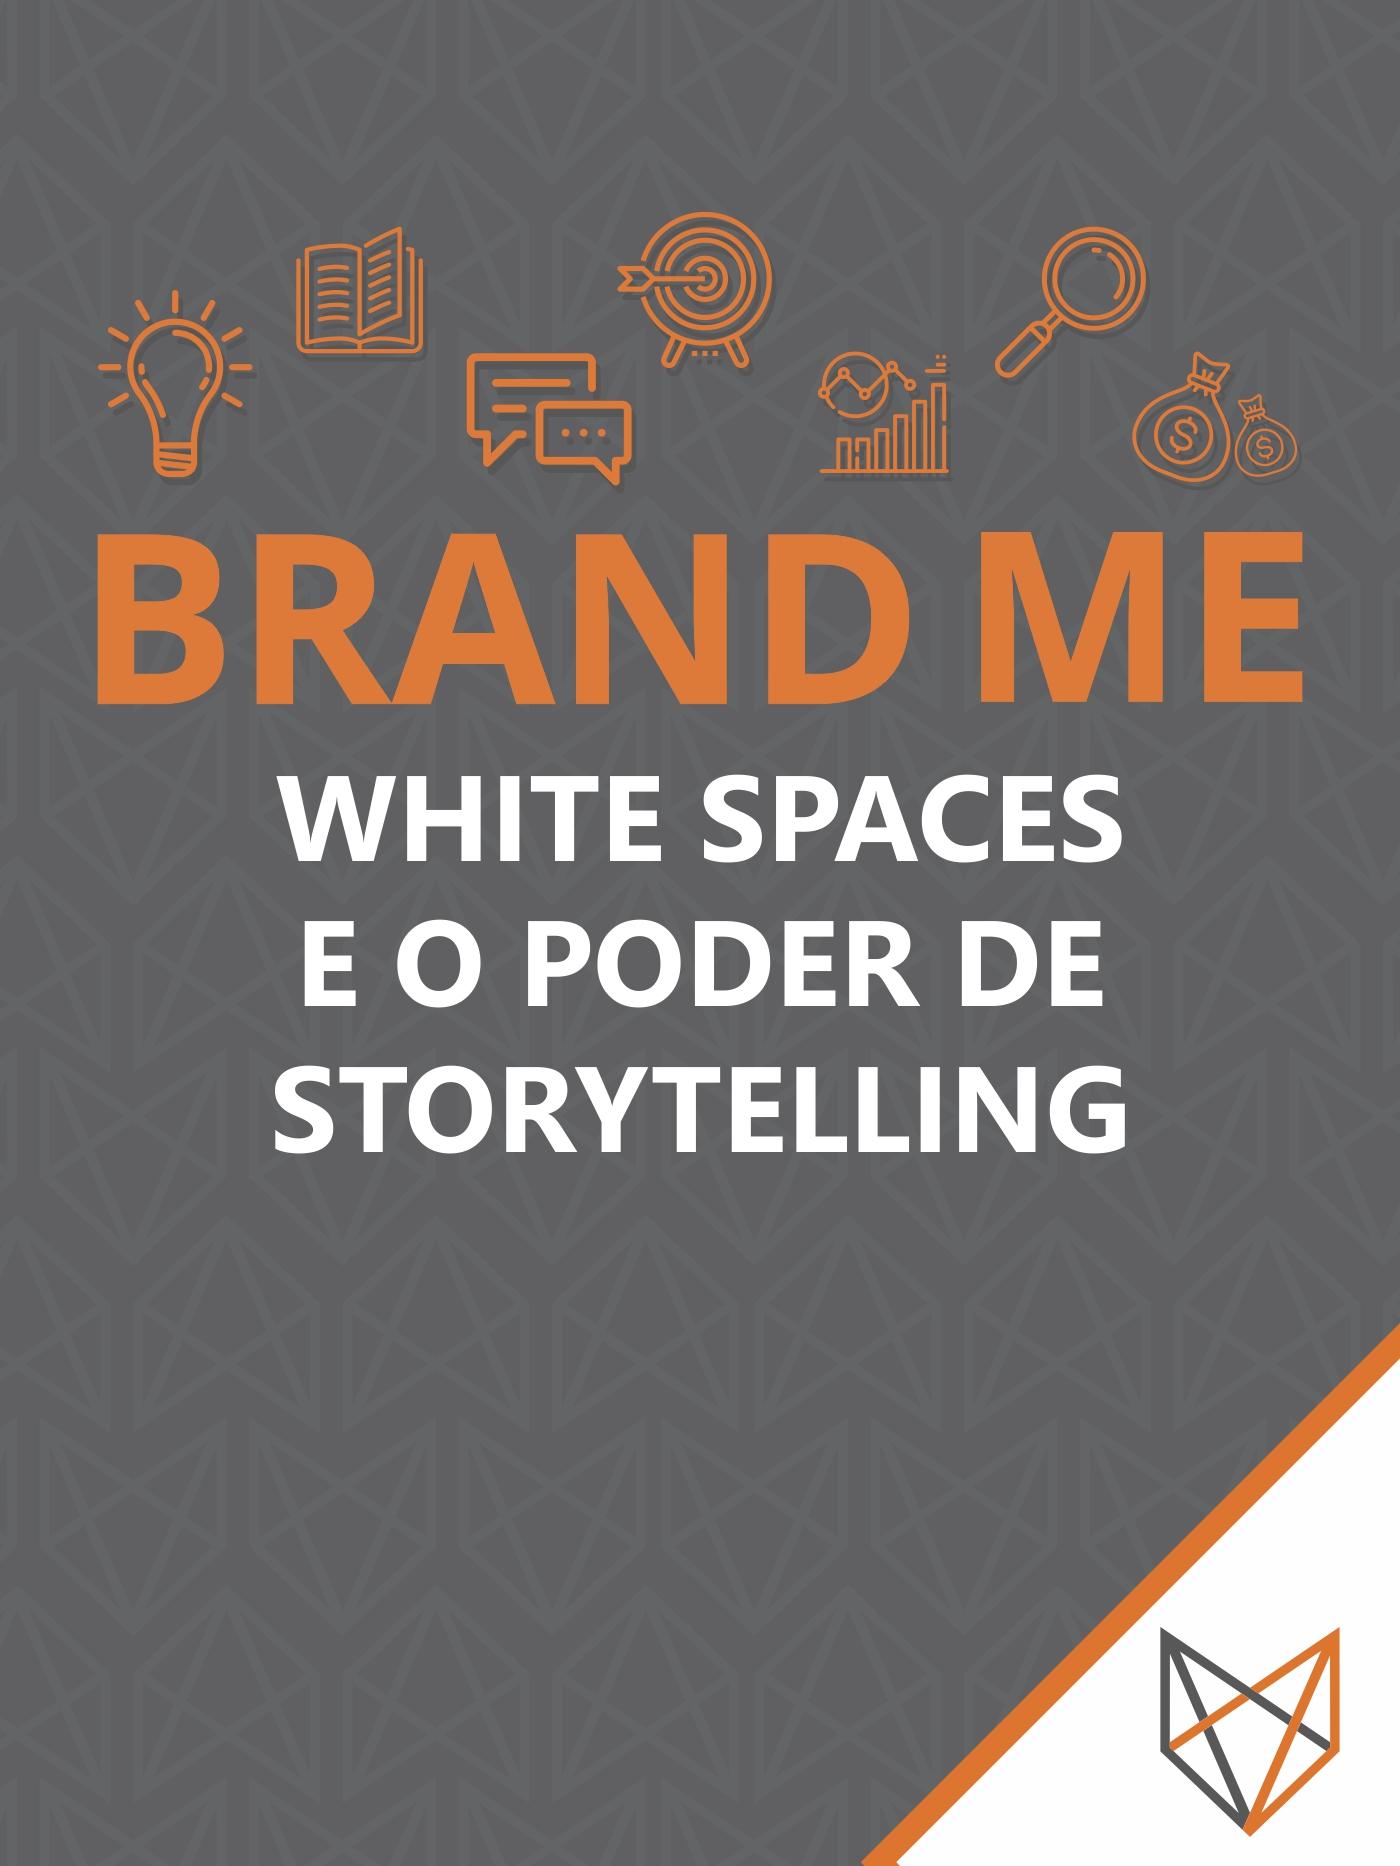 white spaces e o poder de storytelling